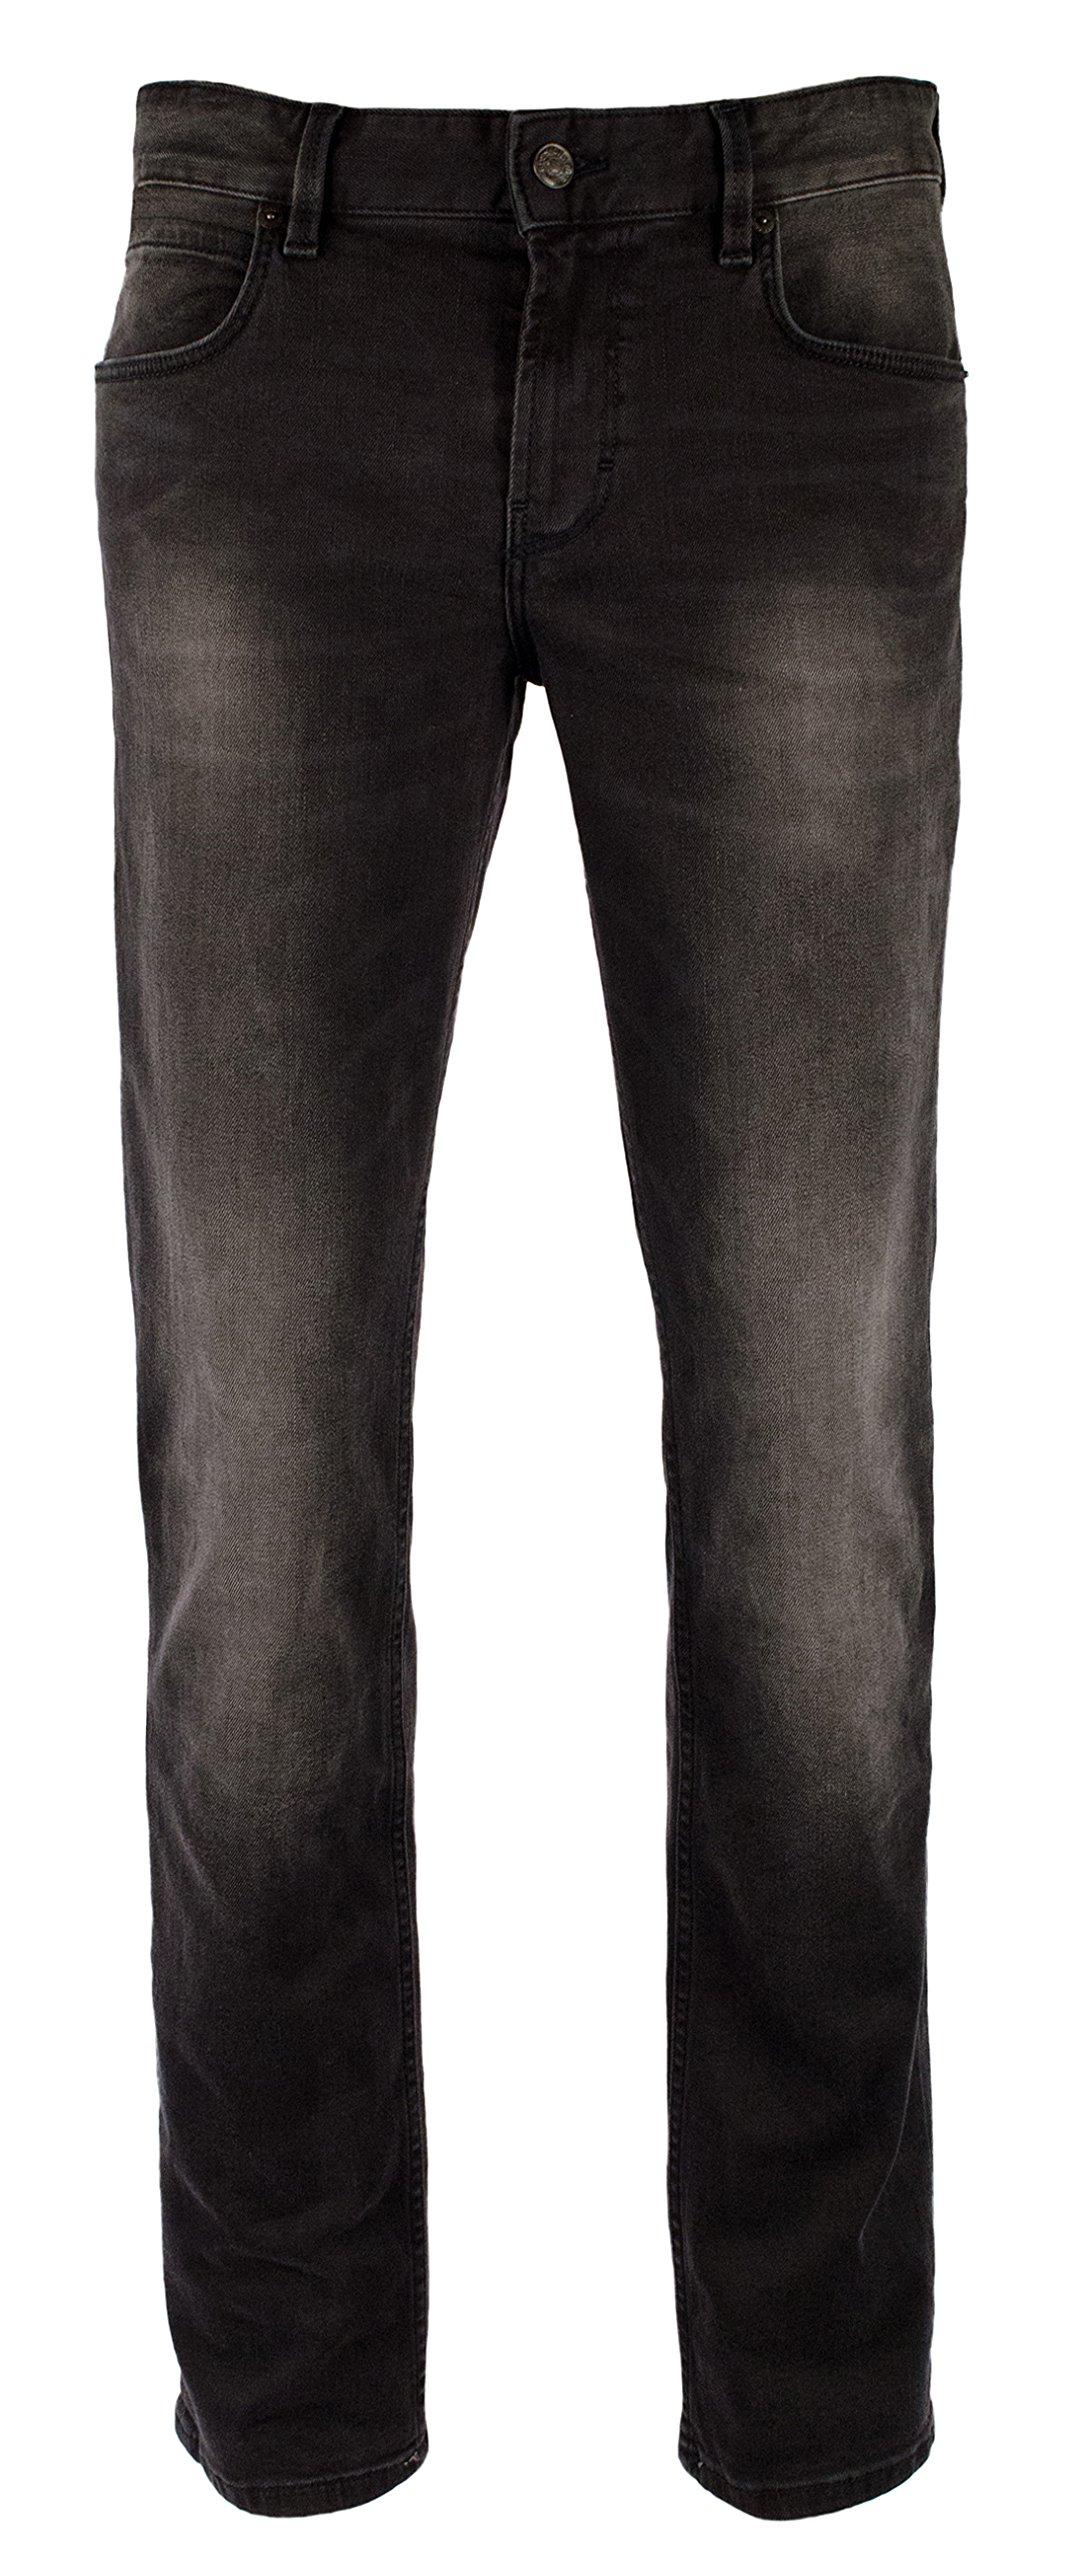 BOSS Orange Men's Orange63 Slim Fit Comfort Jean, Island, 34W x 30L